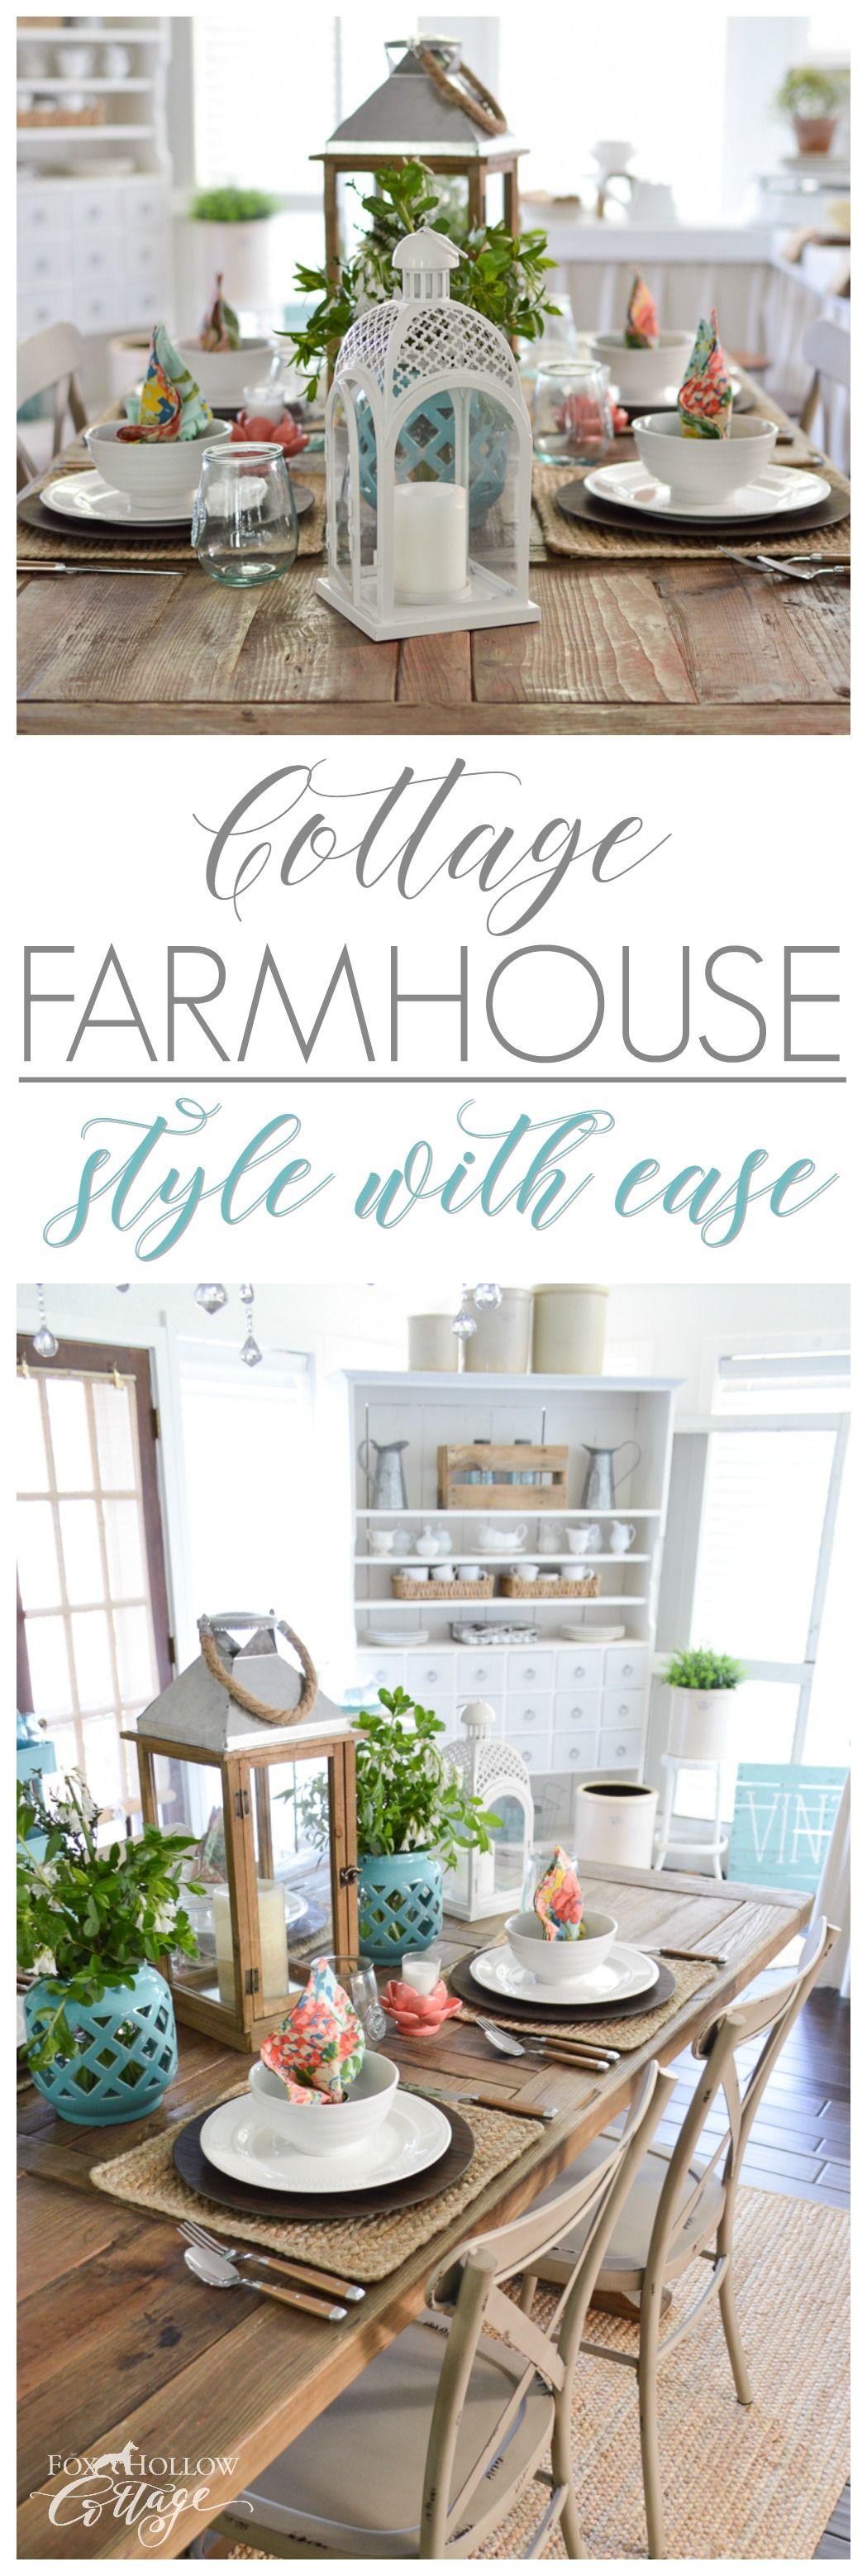 Cottage Farmhouse Table Decorating Ideas | Farming, Farmhouse style ...